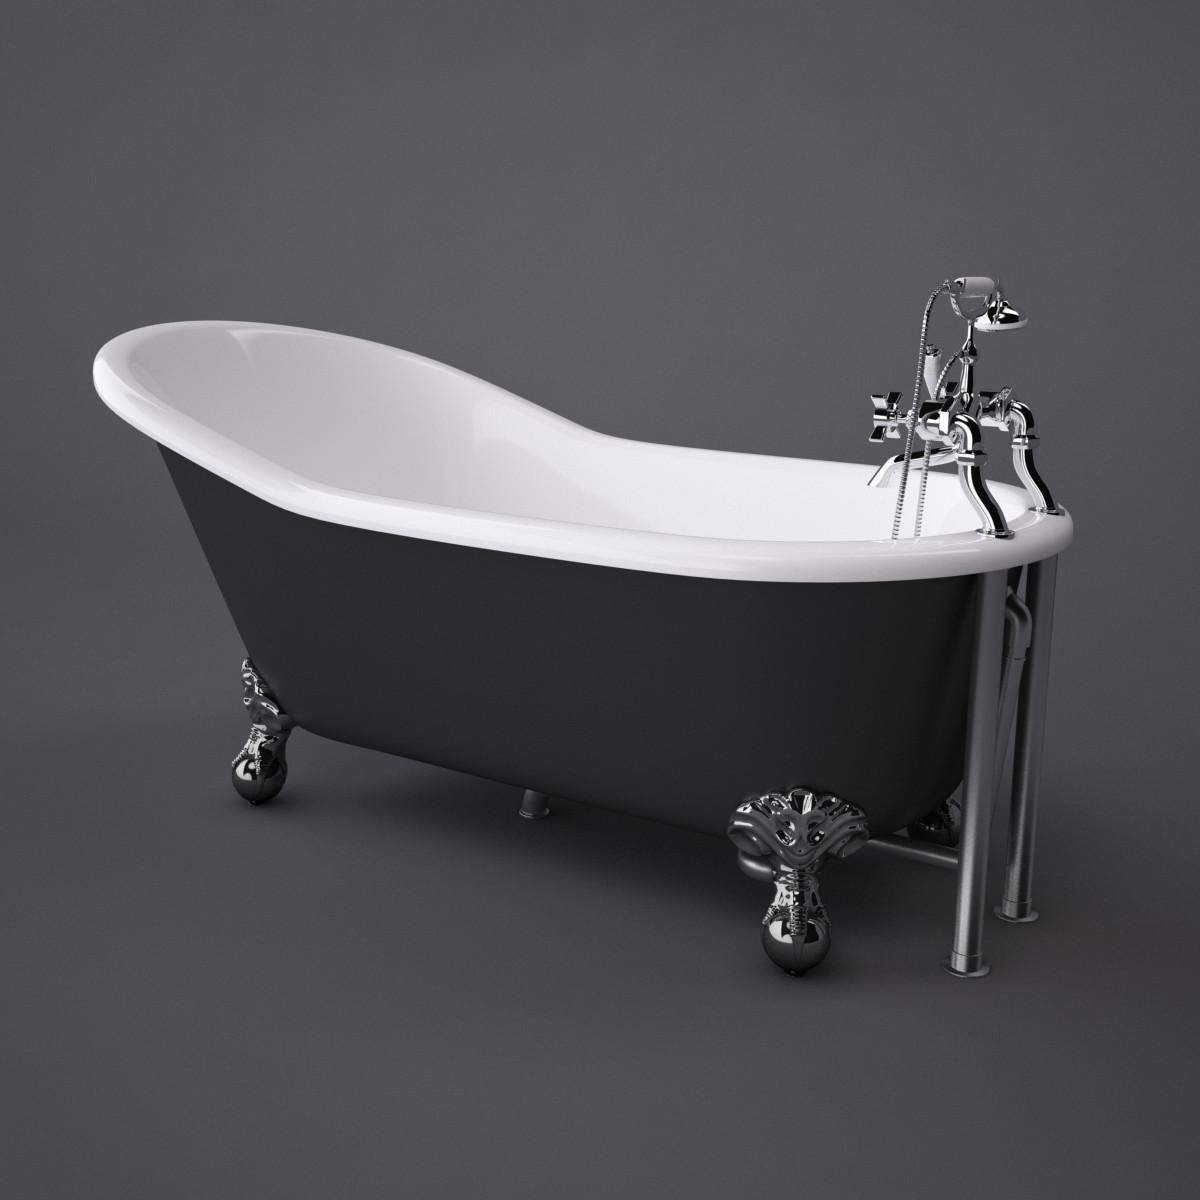 Lovely Tub Paint Tiny Paint Bathtub Flat Bath Tub Paint Paint A Bathtub Young Paint For Tubs Orange Tub Refinishers